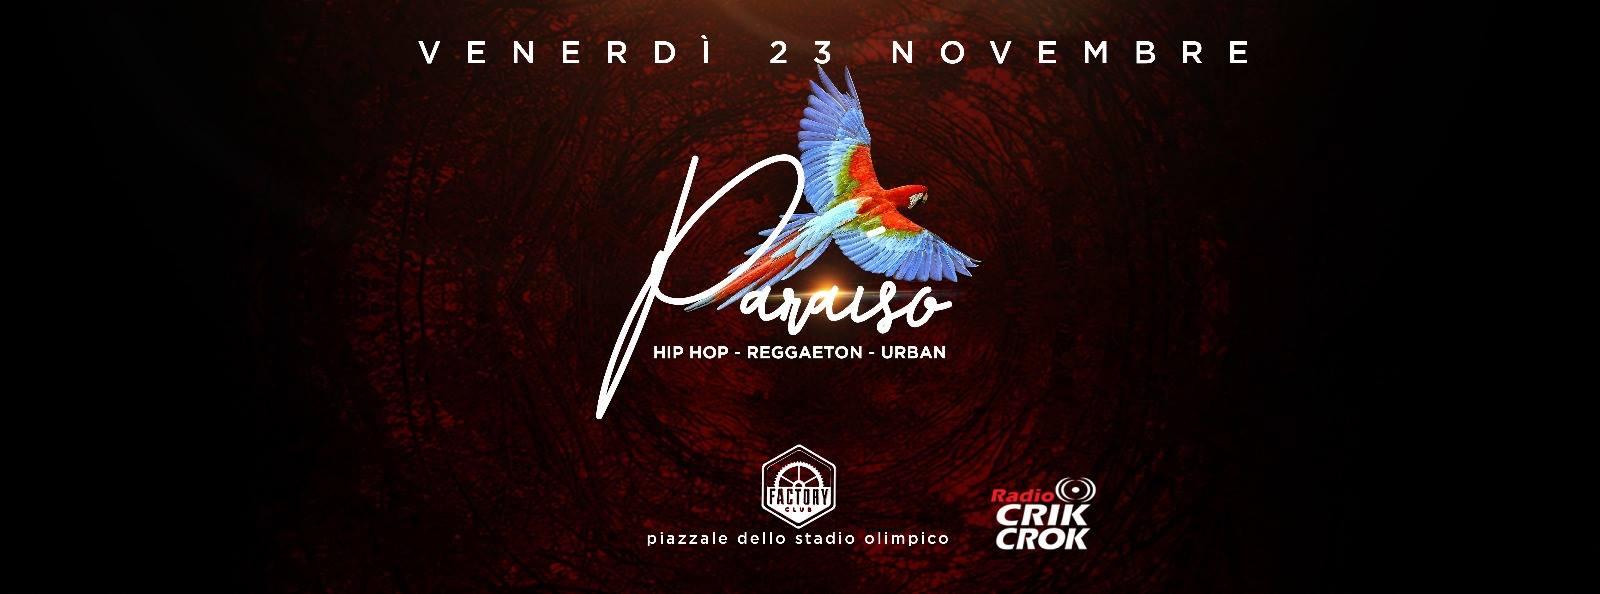 Factory Roma Aperitiv Hip Hop